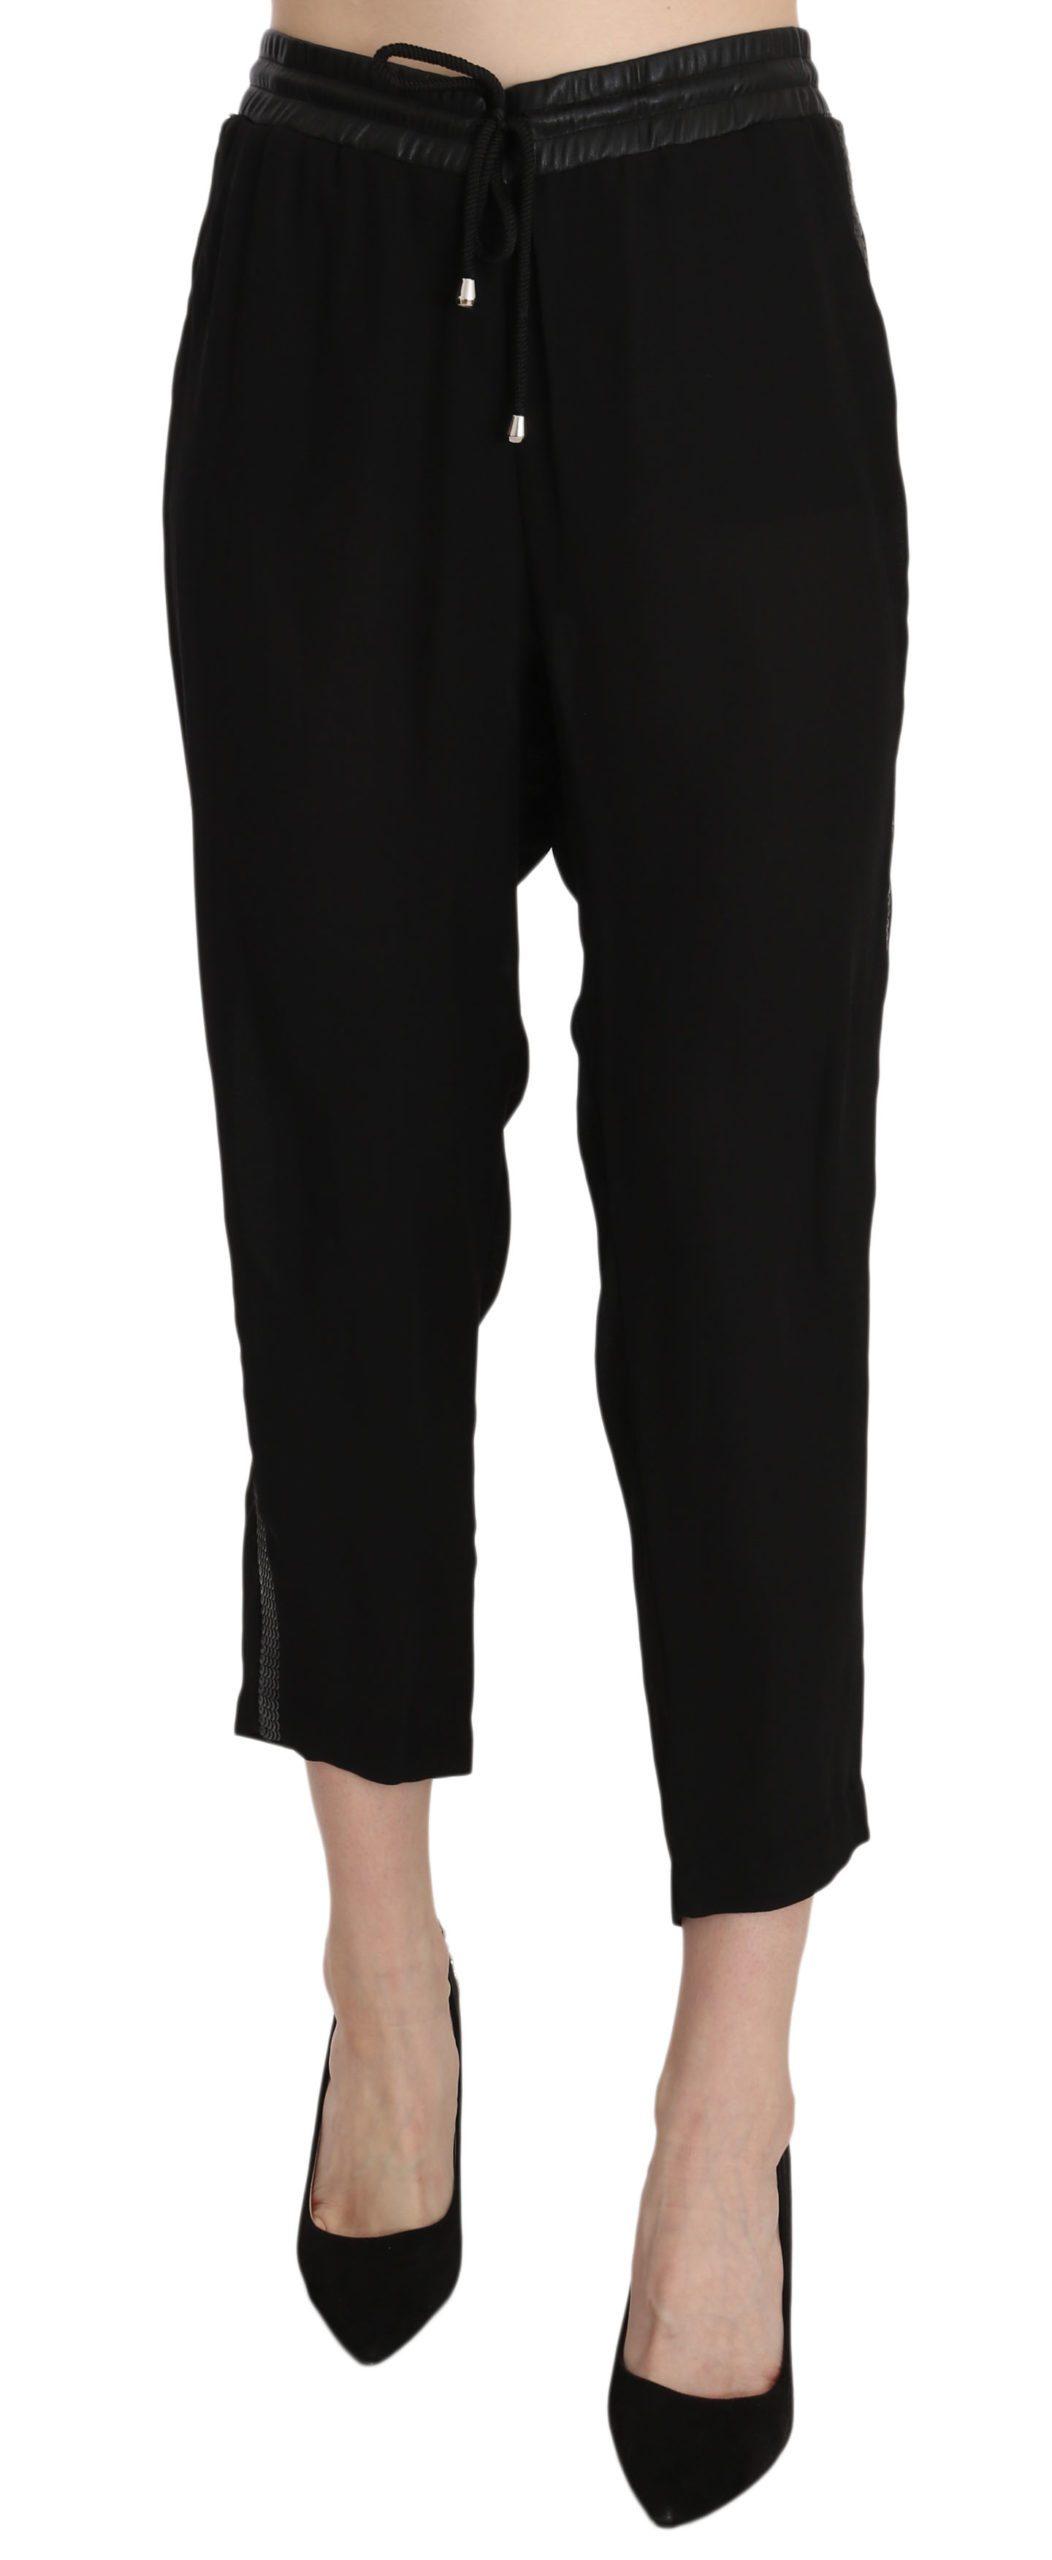 Guess Women's Polyester High Waist Cropped Trouser Black PAN70295 - IT44 L